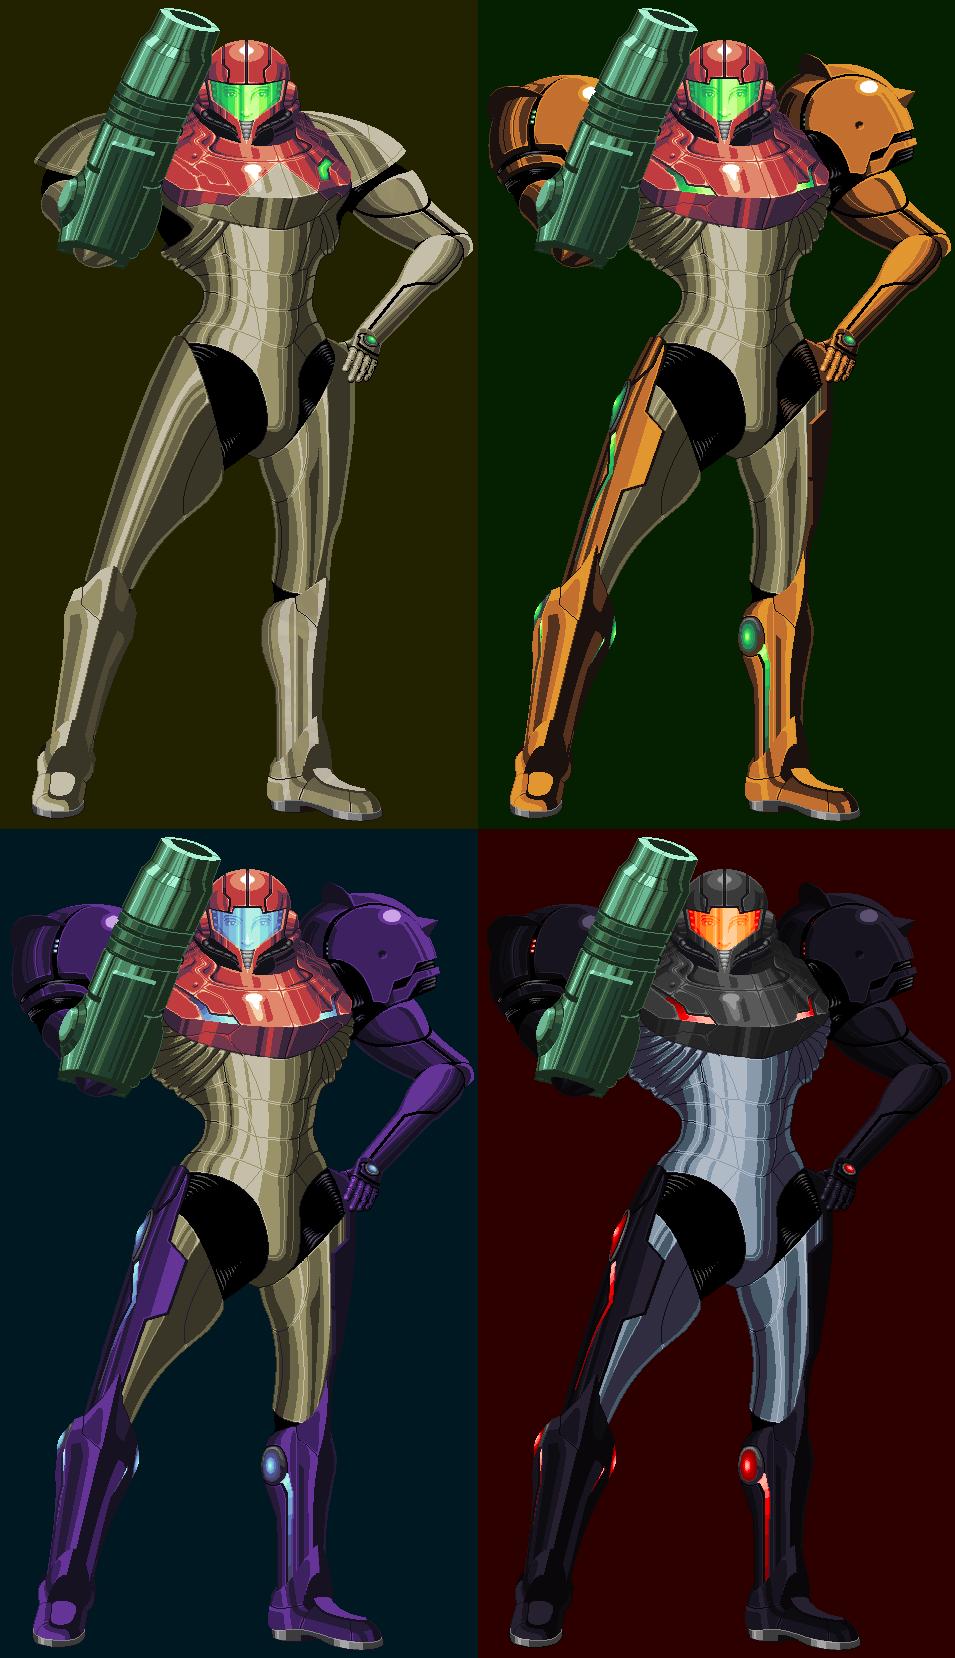 metroid prime anniversary samus aran s suits by killpanzer on